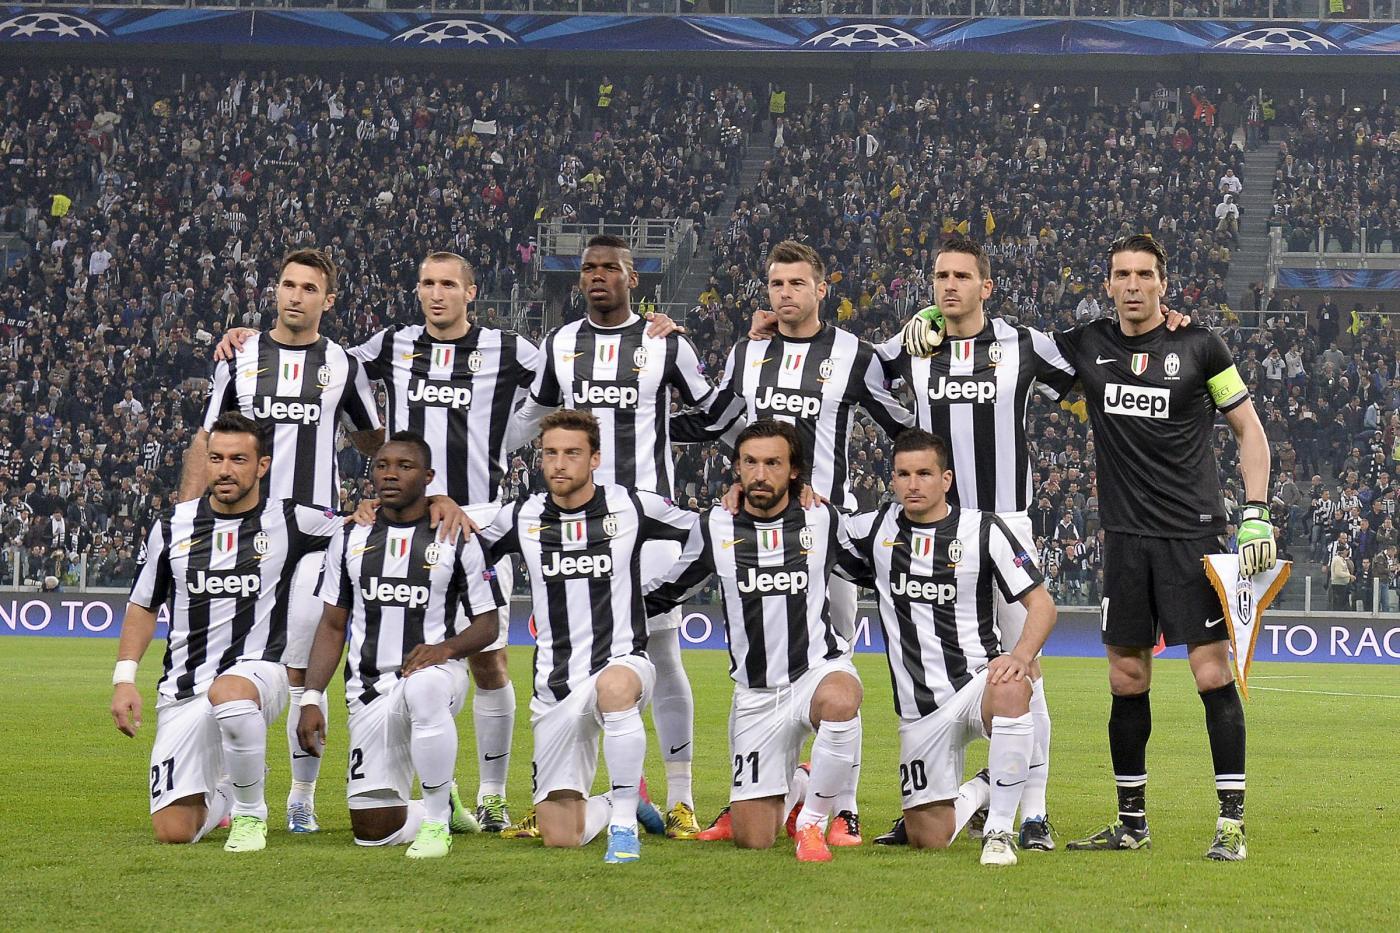 Juventus vs. Bayern Monaco